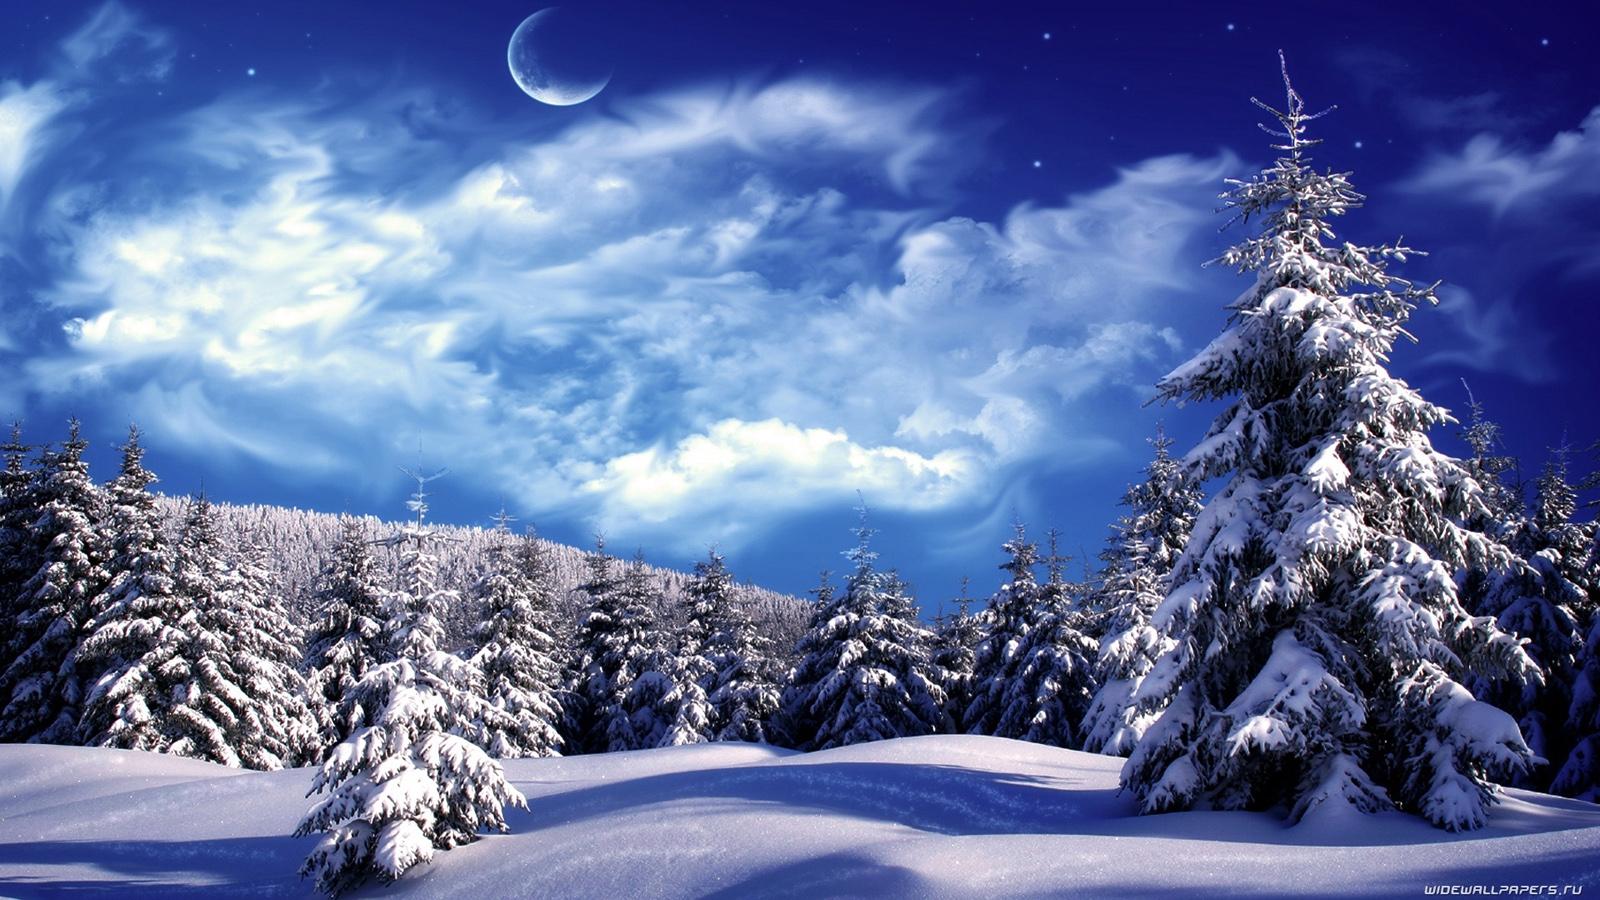 Картинки зима на рабочий стол — подборка обоев024